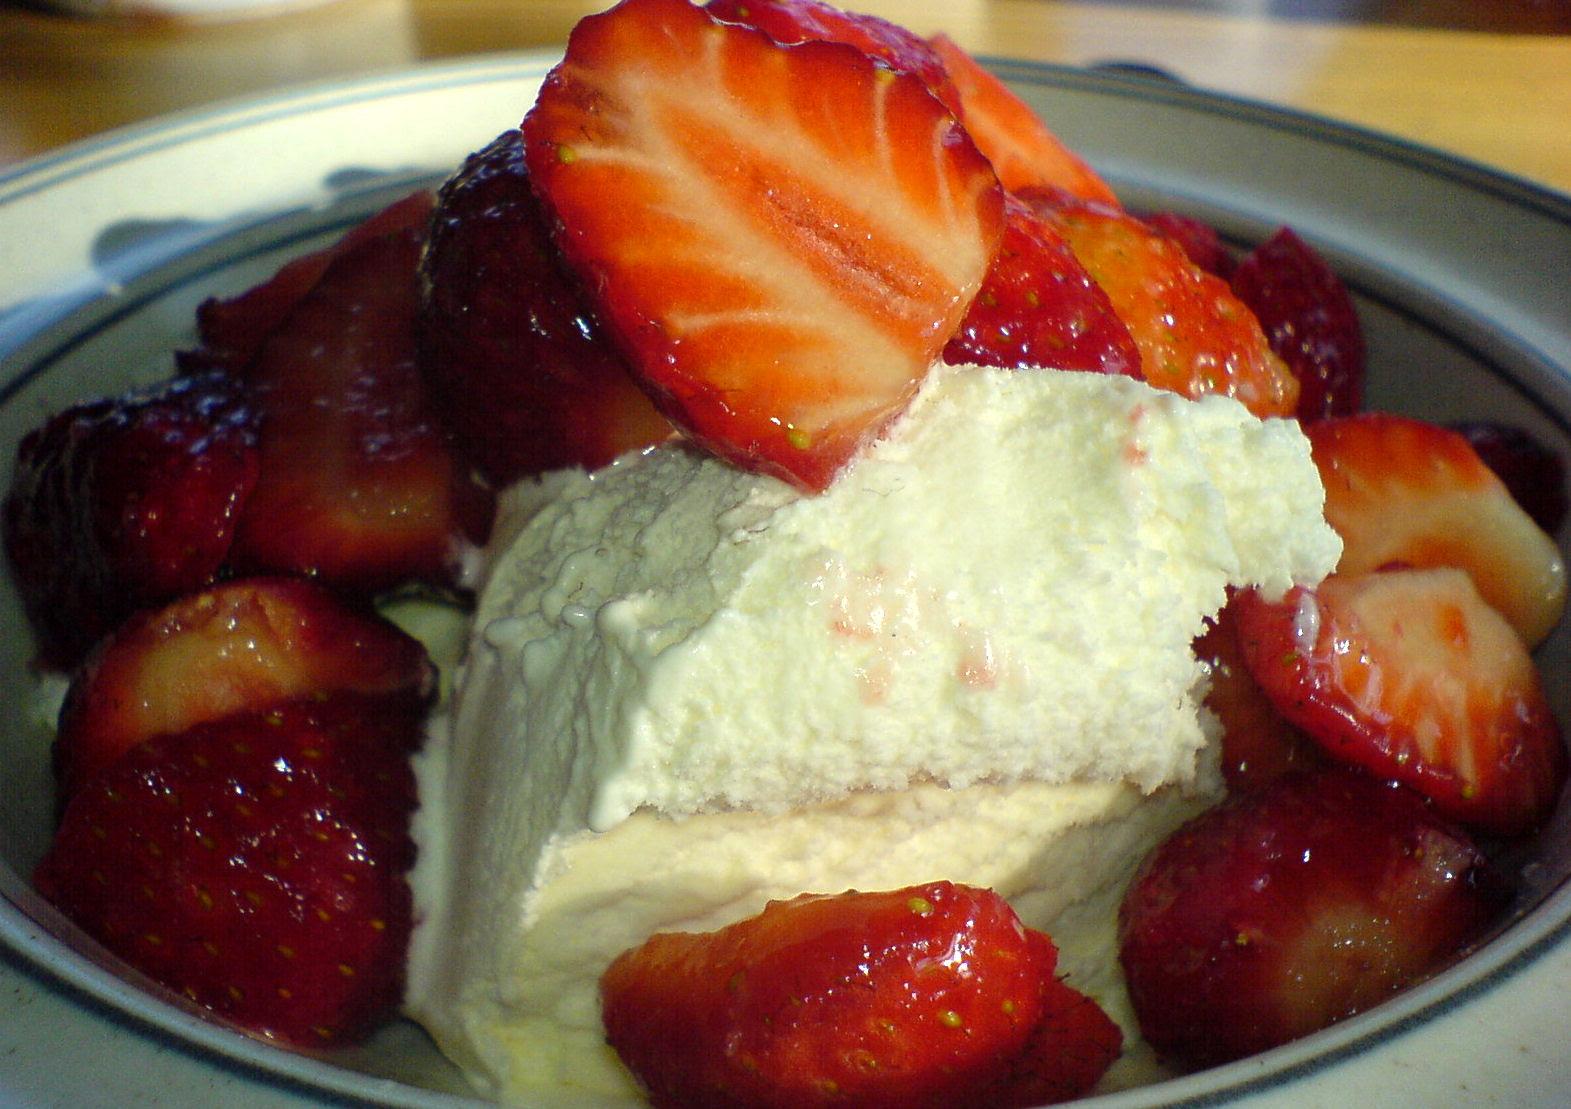 http://upload.wikimedia.org/wikipedia/commons/8/8e/Strawberry_ice_cream_dessert.jpg